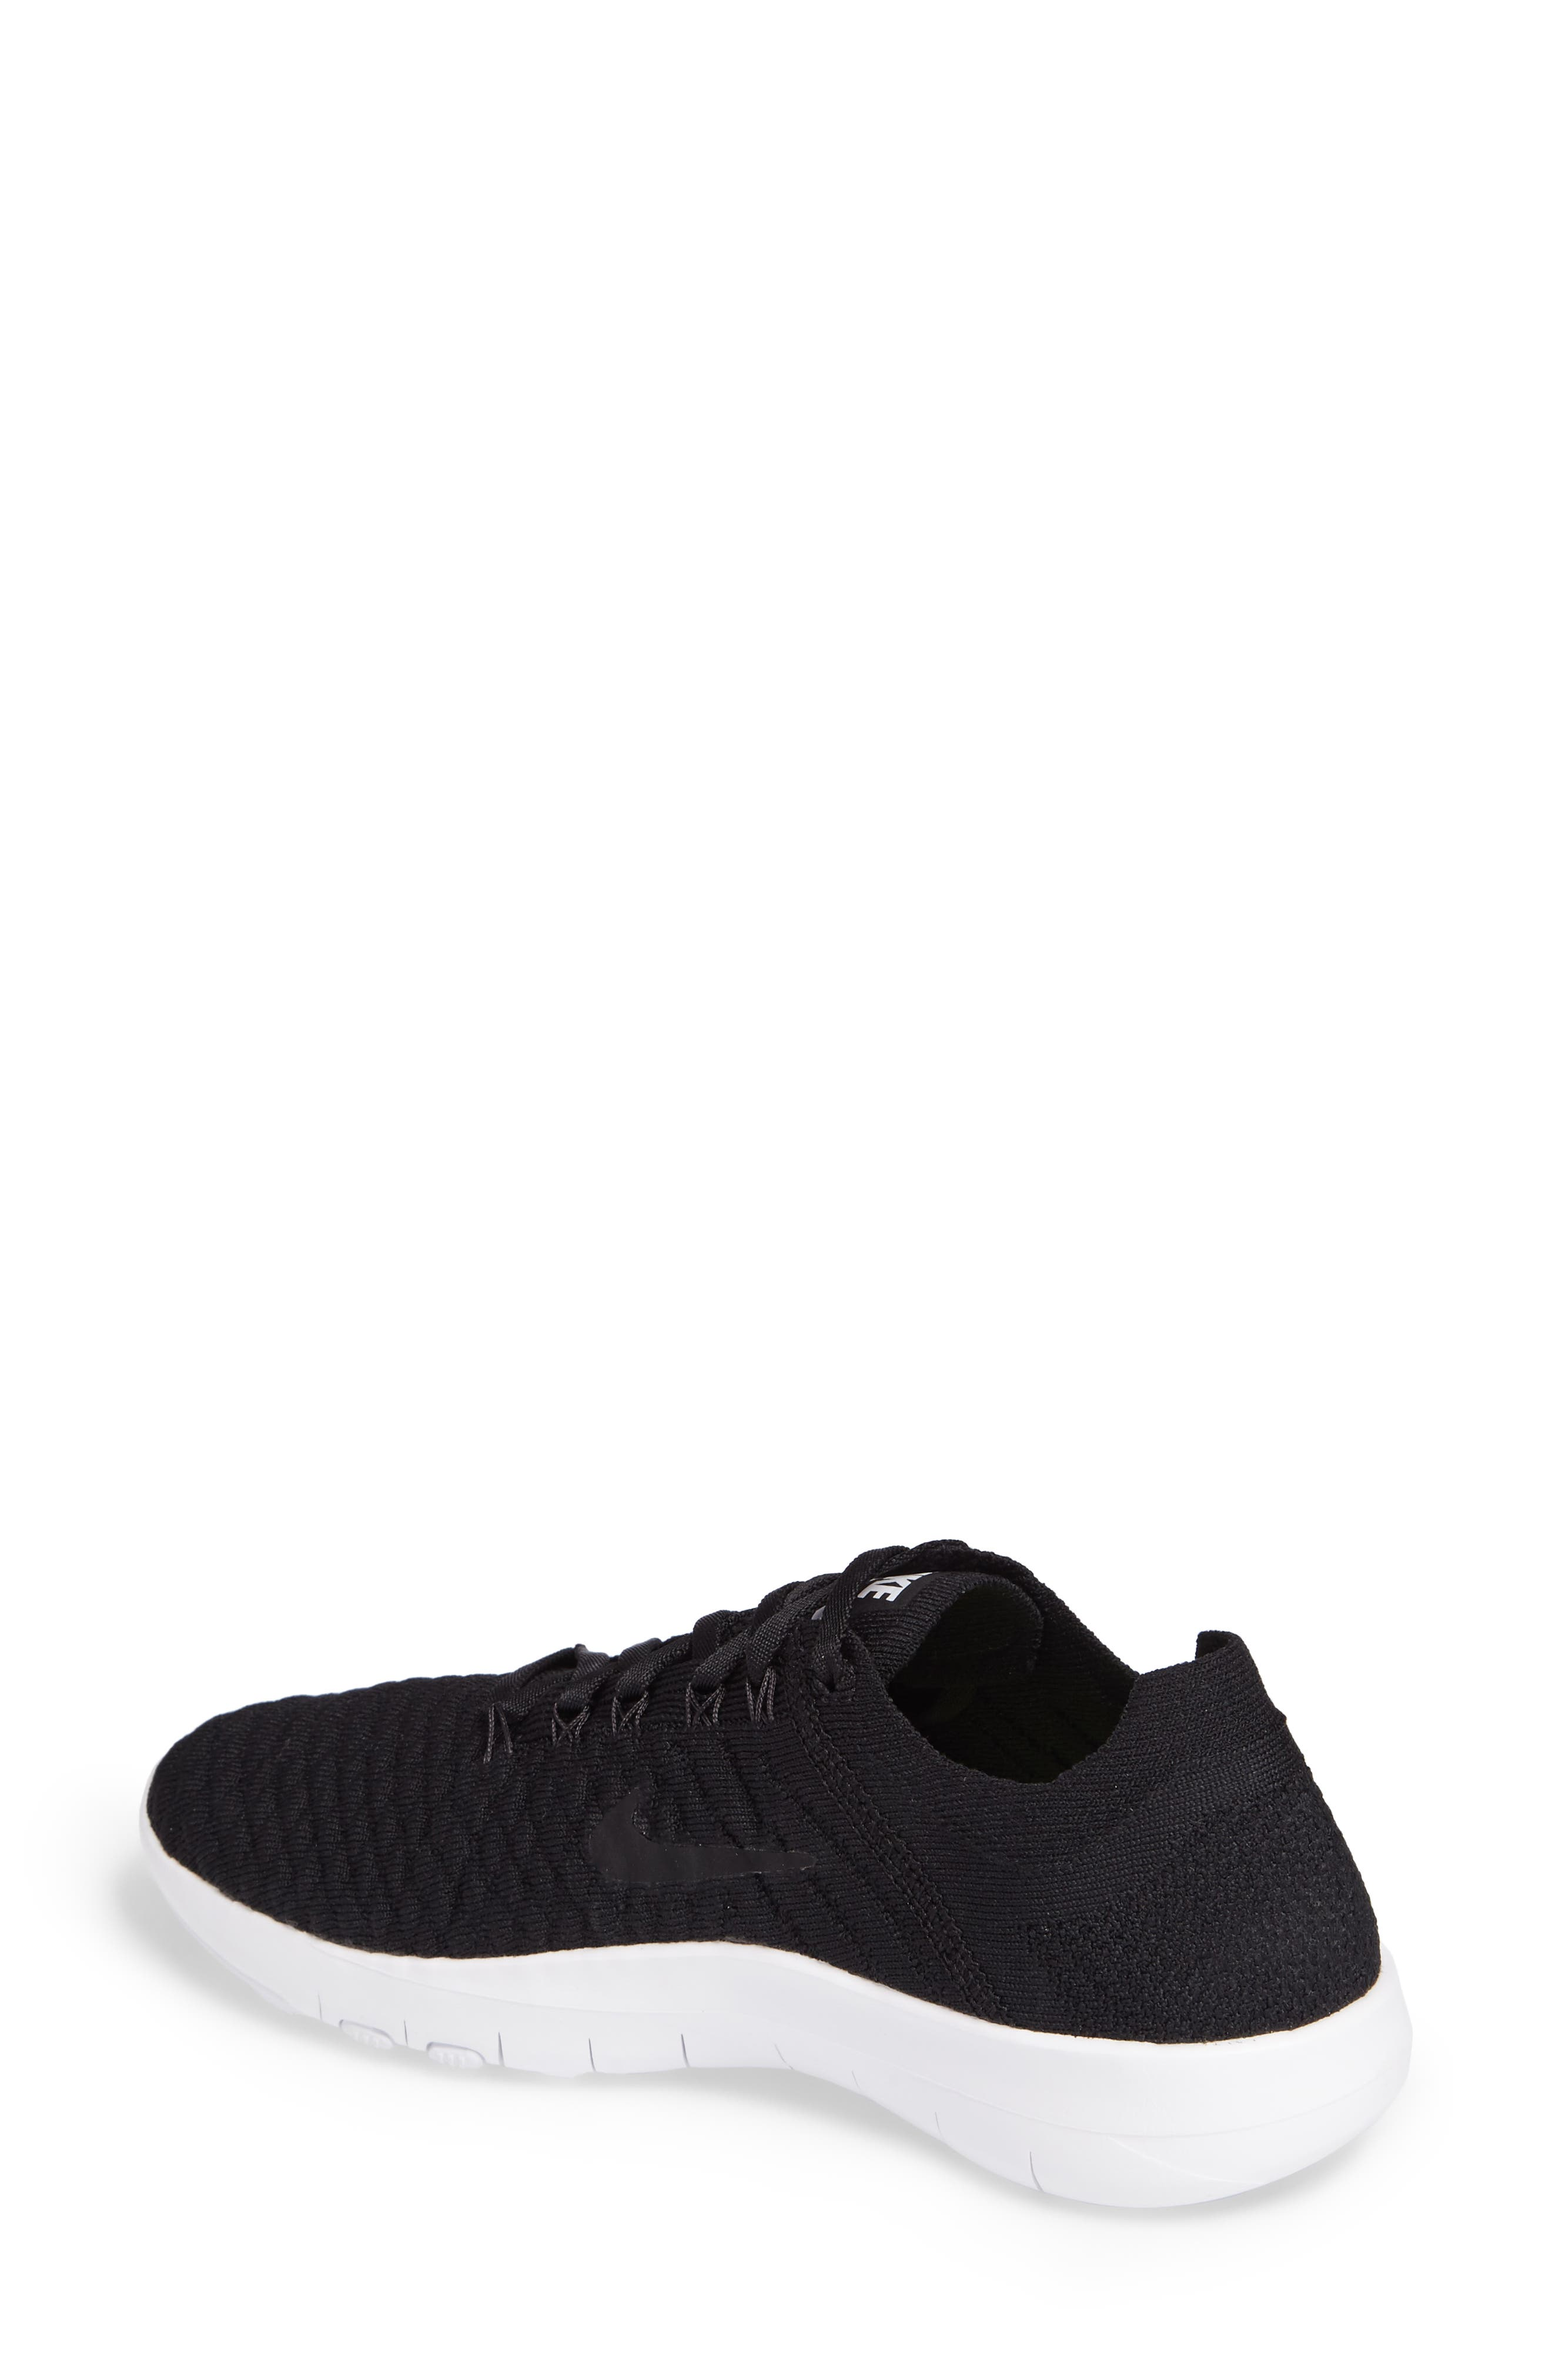 Free TR Flyknit 2 Training Shoe,                             Alternate thumbnail 2, color,                             Black/ Black/ White